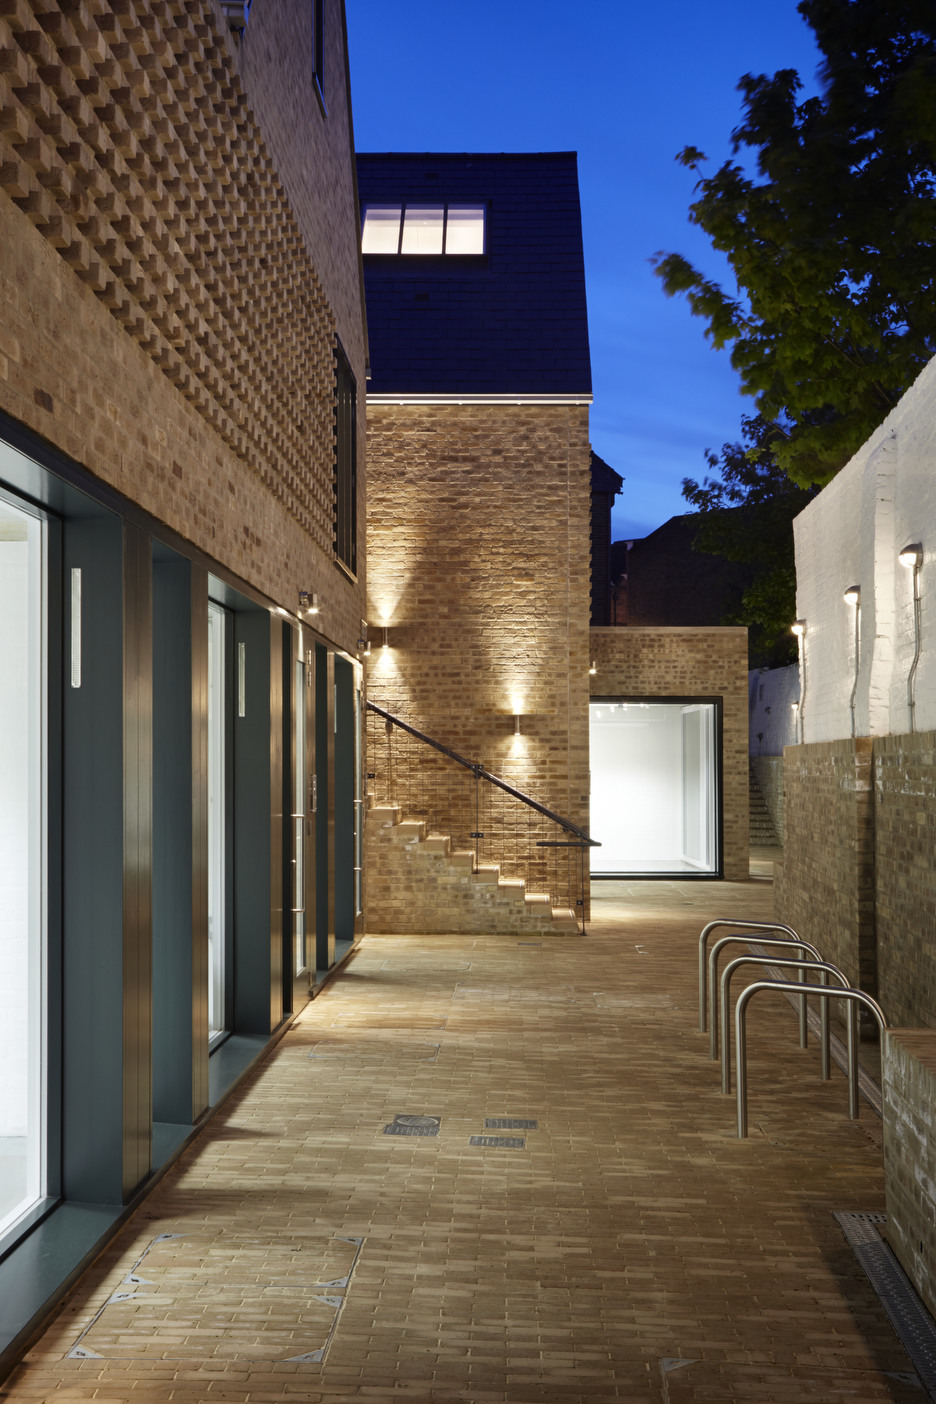 Courtyard (night)